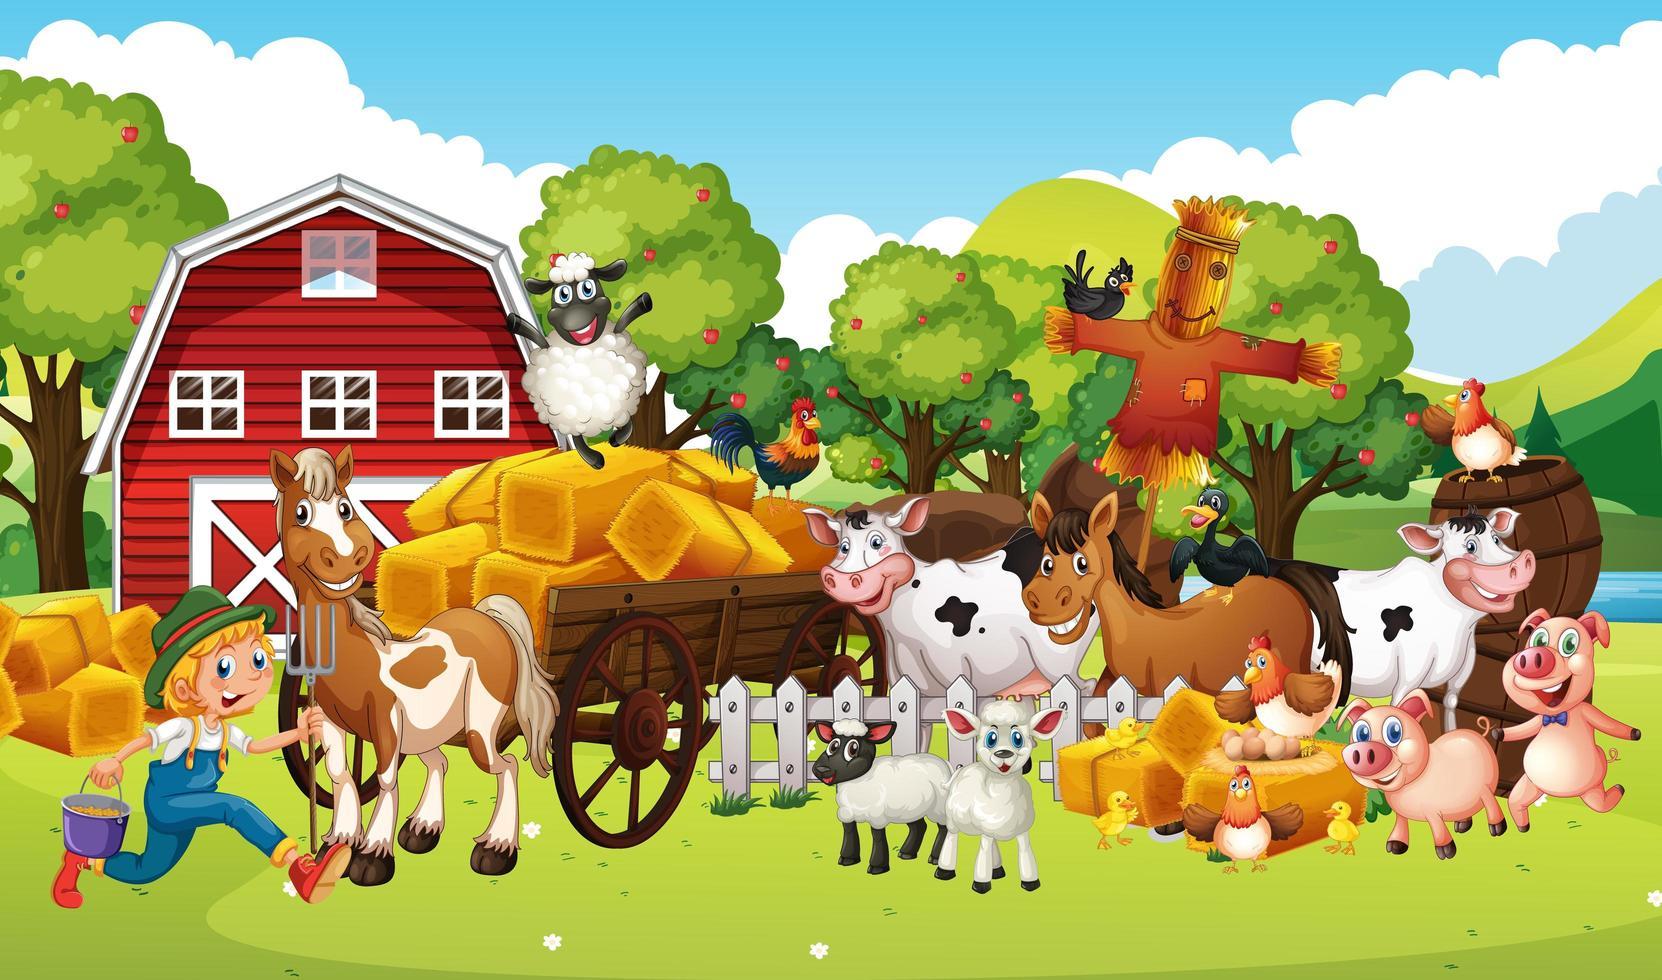 Farm in a nature scene with animal farm vector